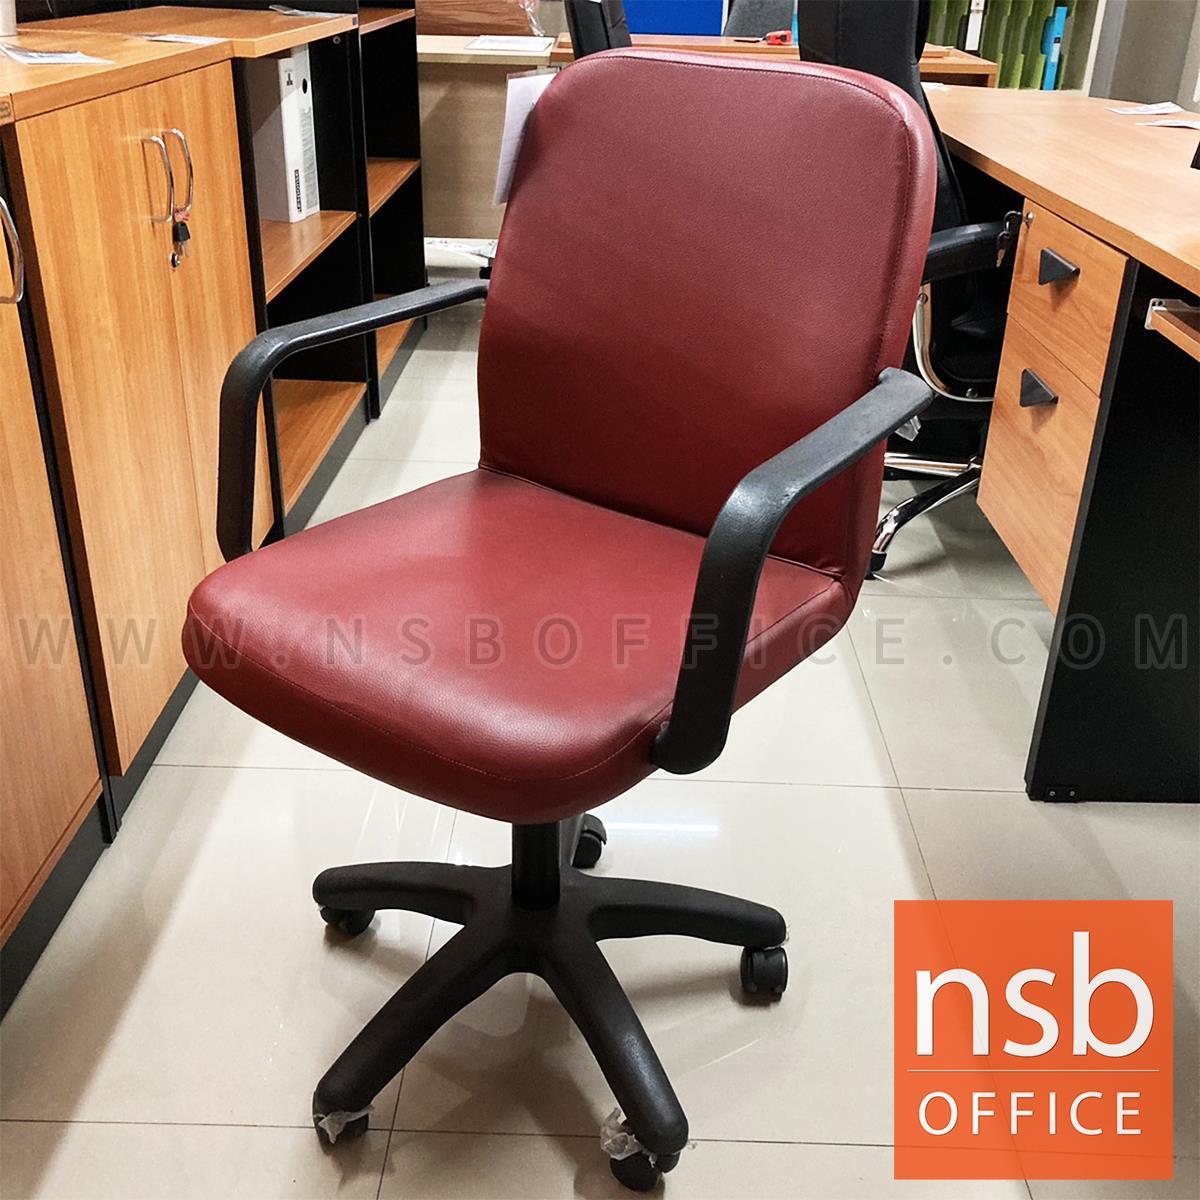 L02A381:เก้าอี้สำนักงาน    ขาพลาสติก